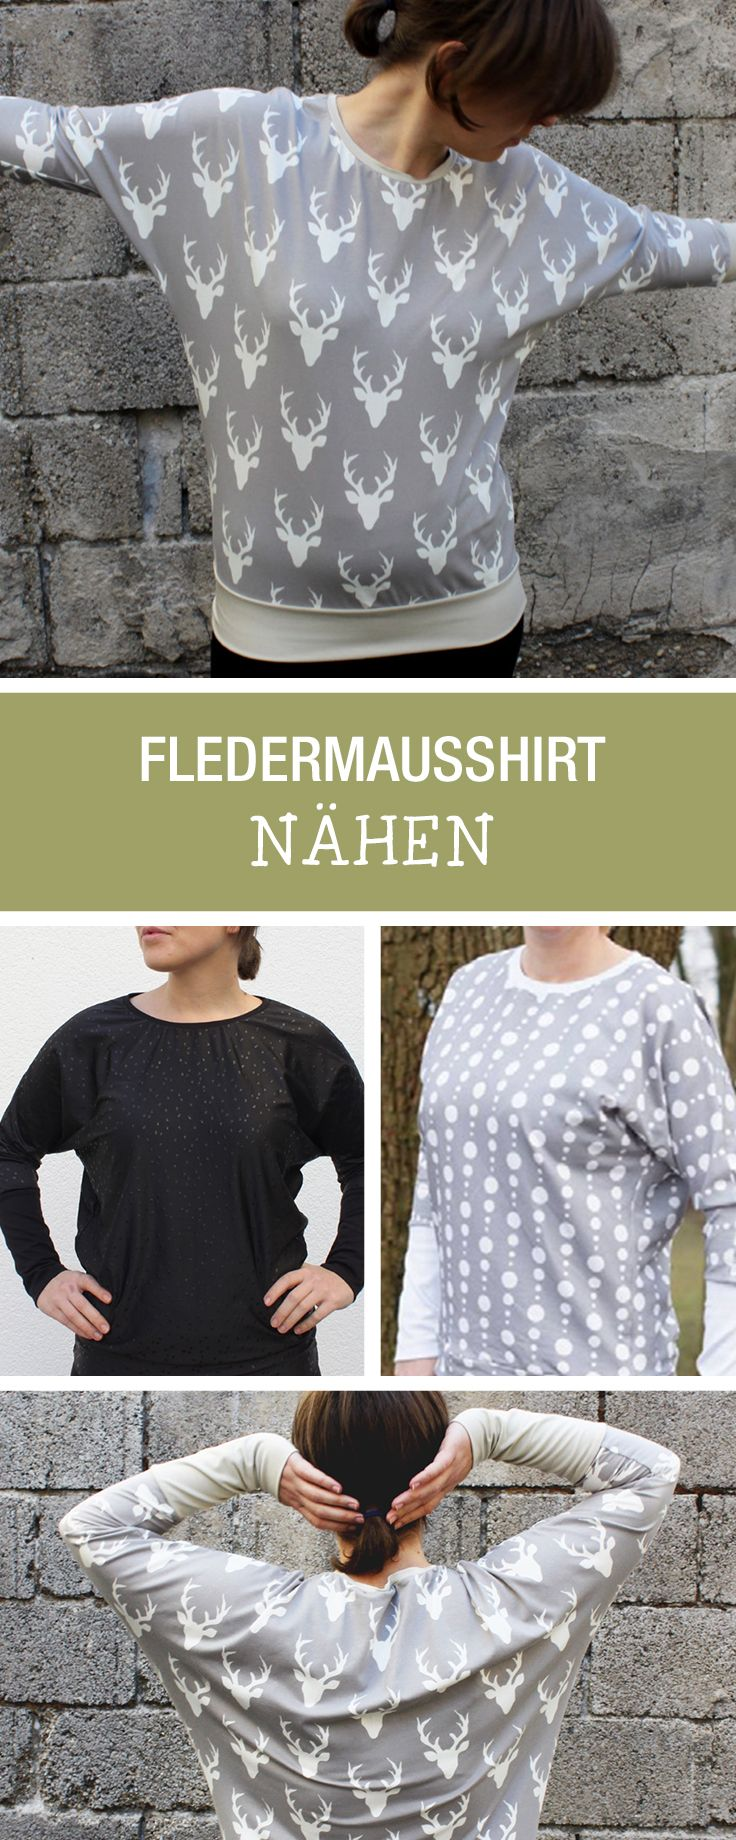 Nähanleitung für einen lässigen Pullover mit Fledermausärmeln / sewing tutorial for a casual shirt with batwing sleeves via DaWanda.com